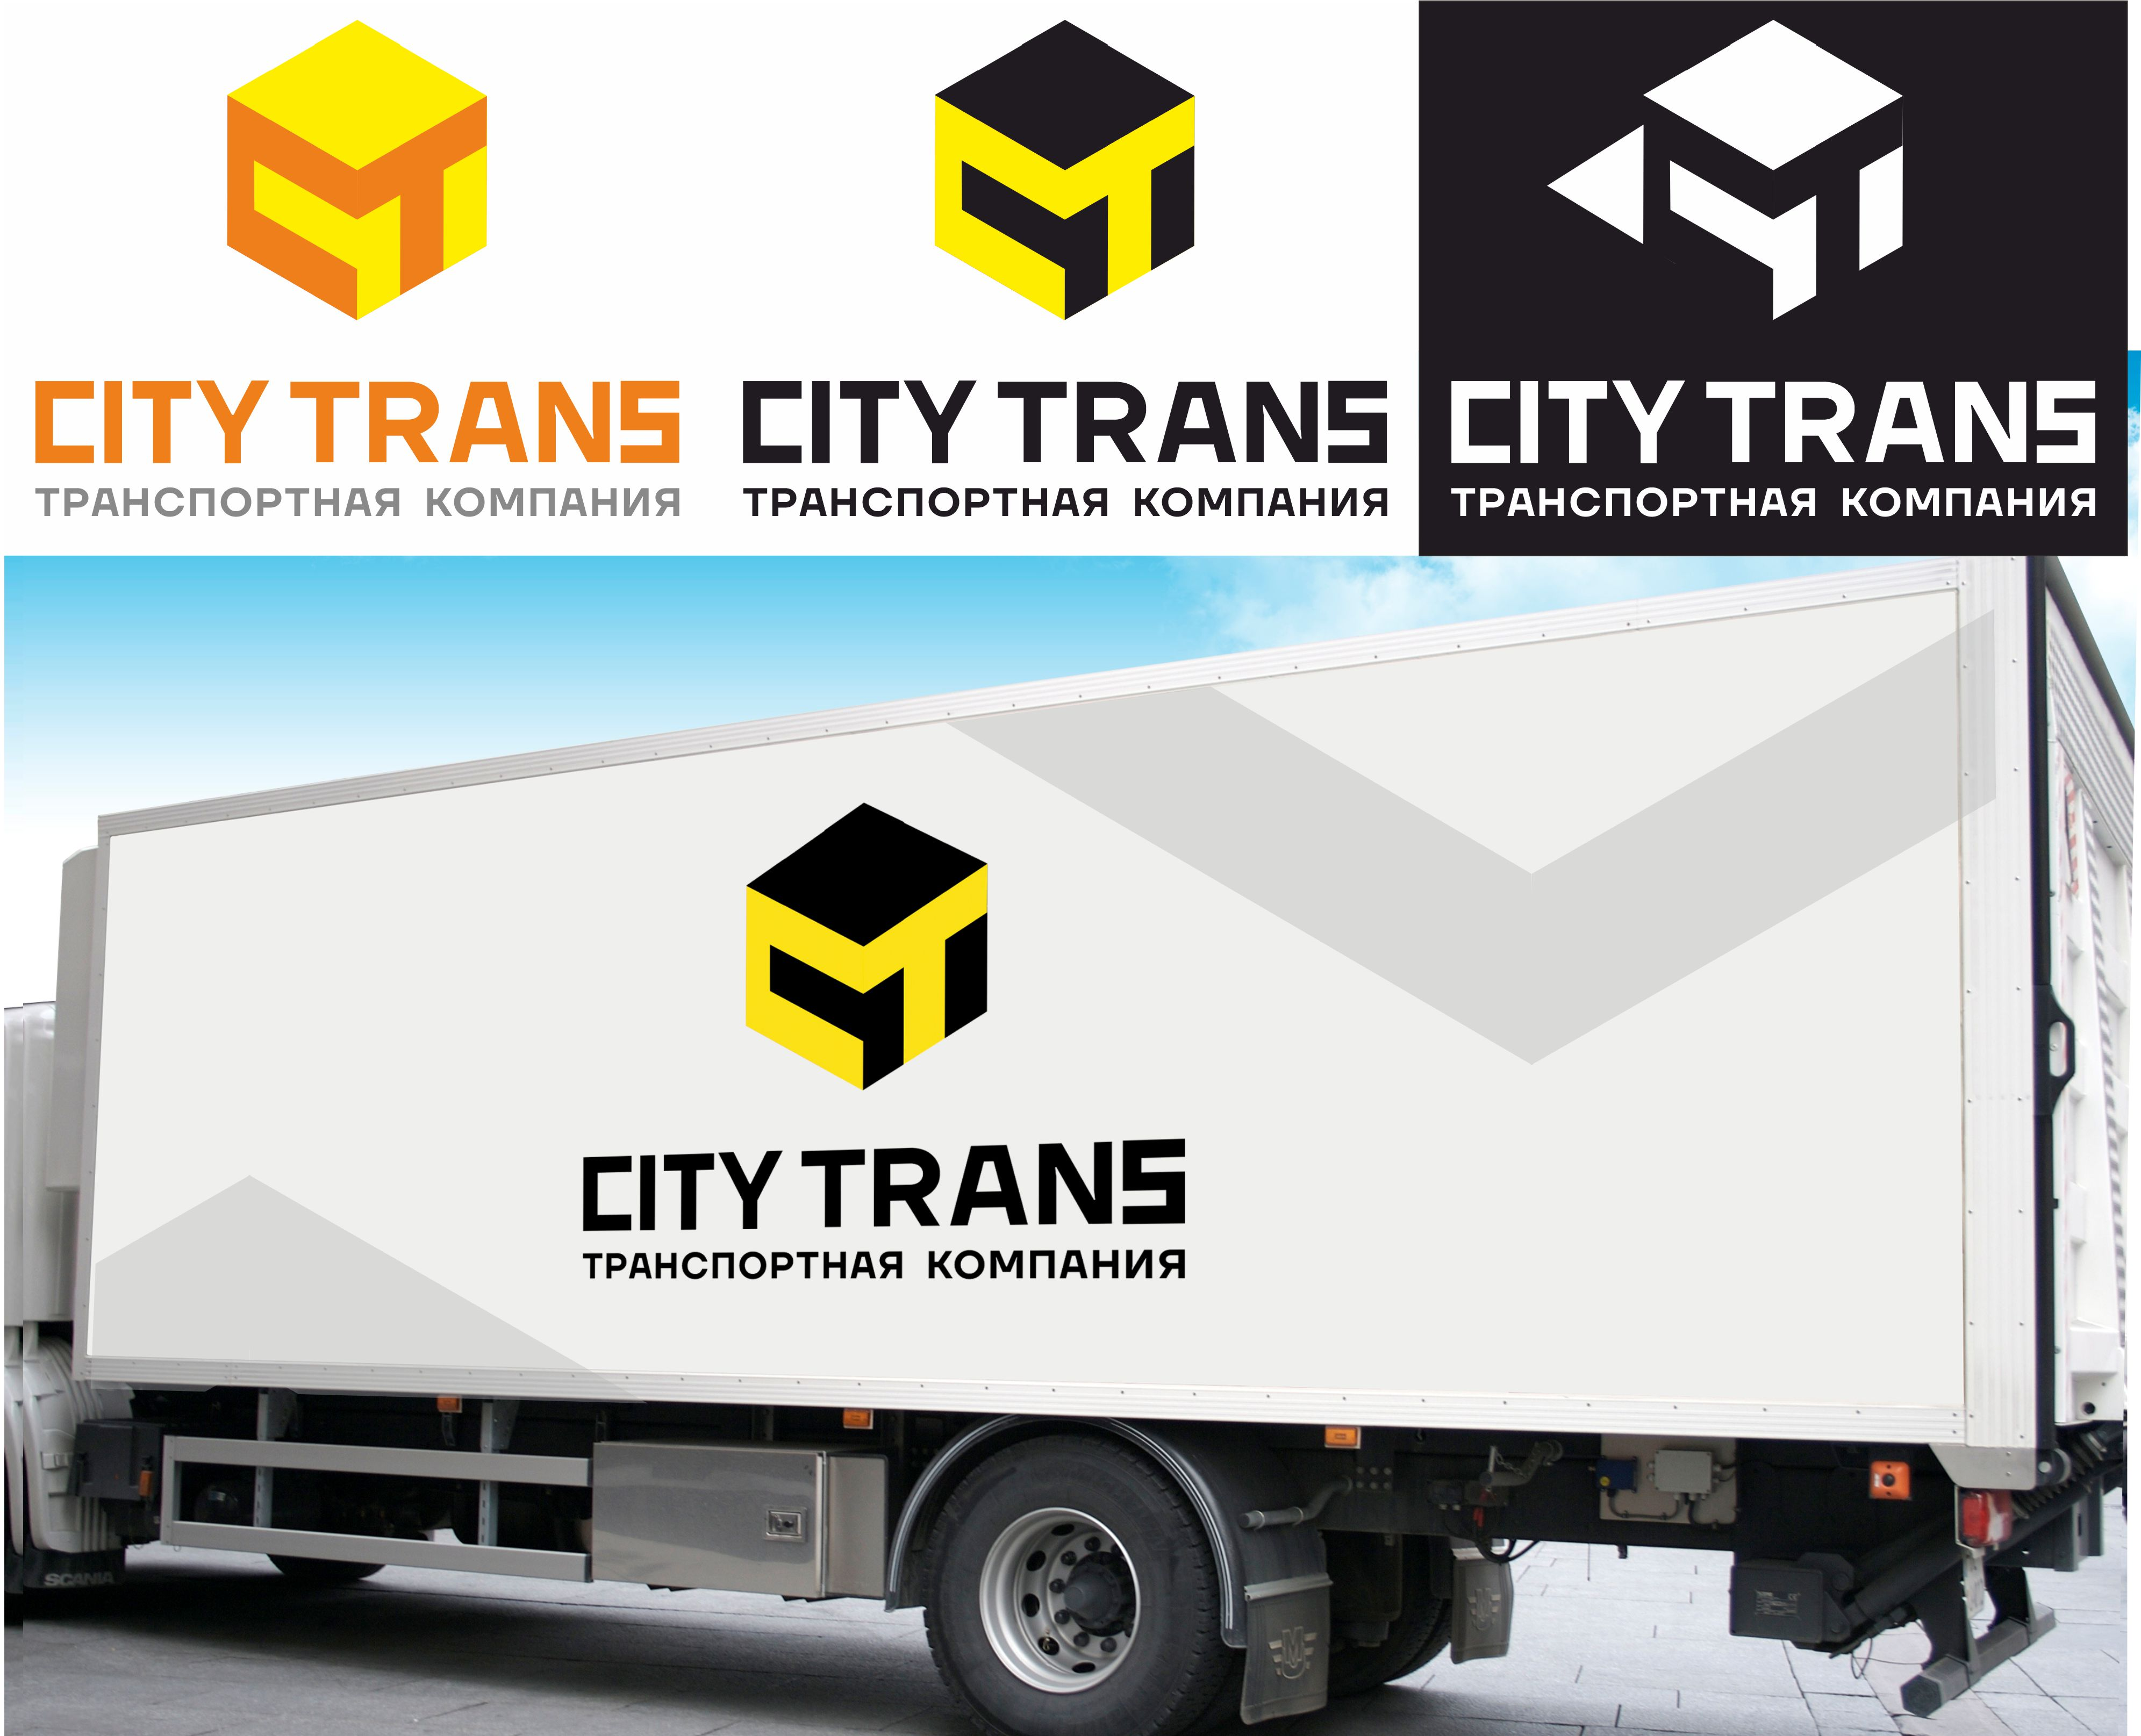 Разработка Логотипа транспортной компании фото f_0765e75c14d5149c.jpg